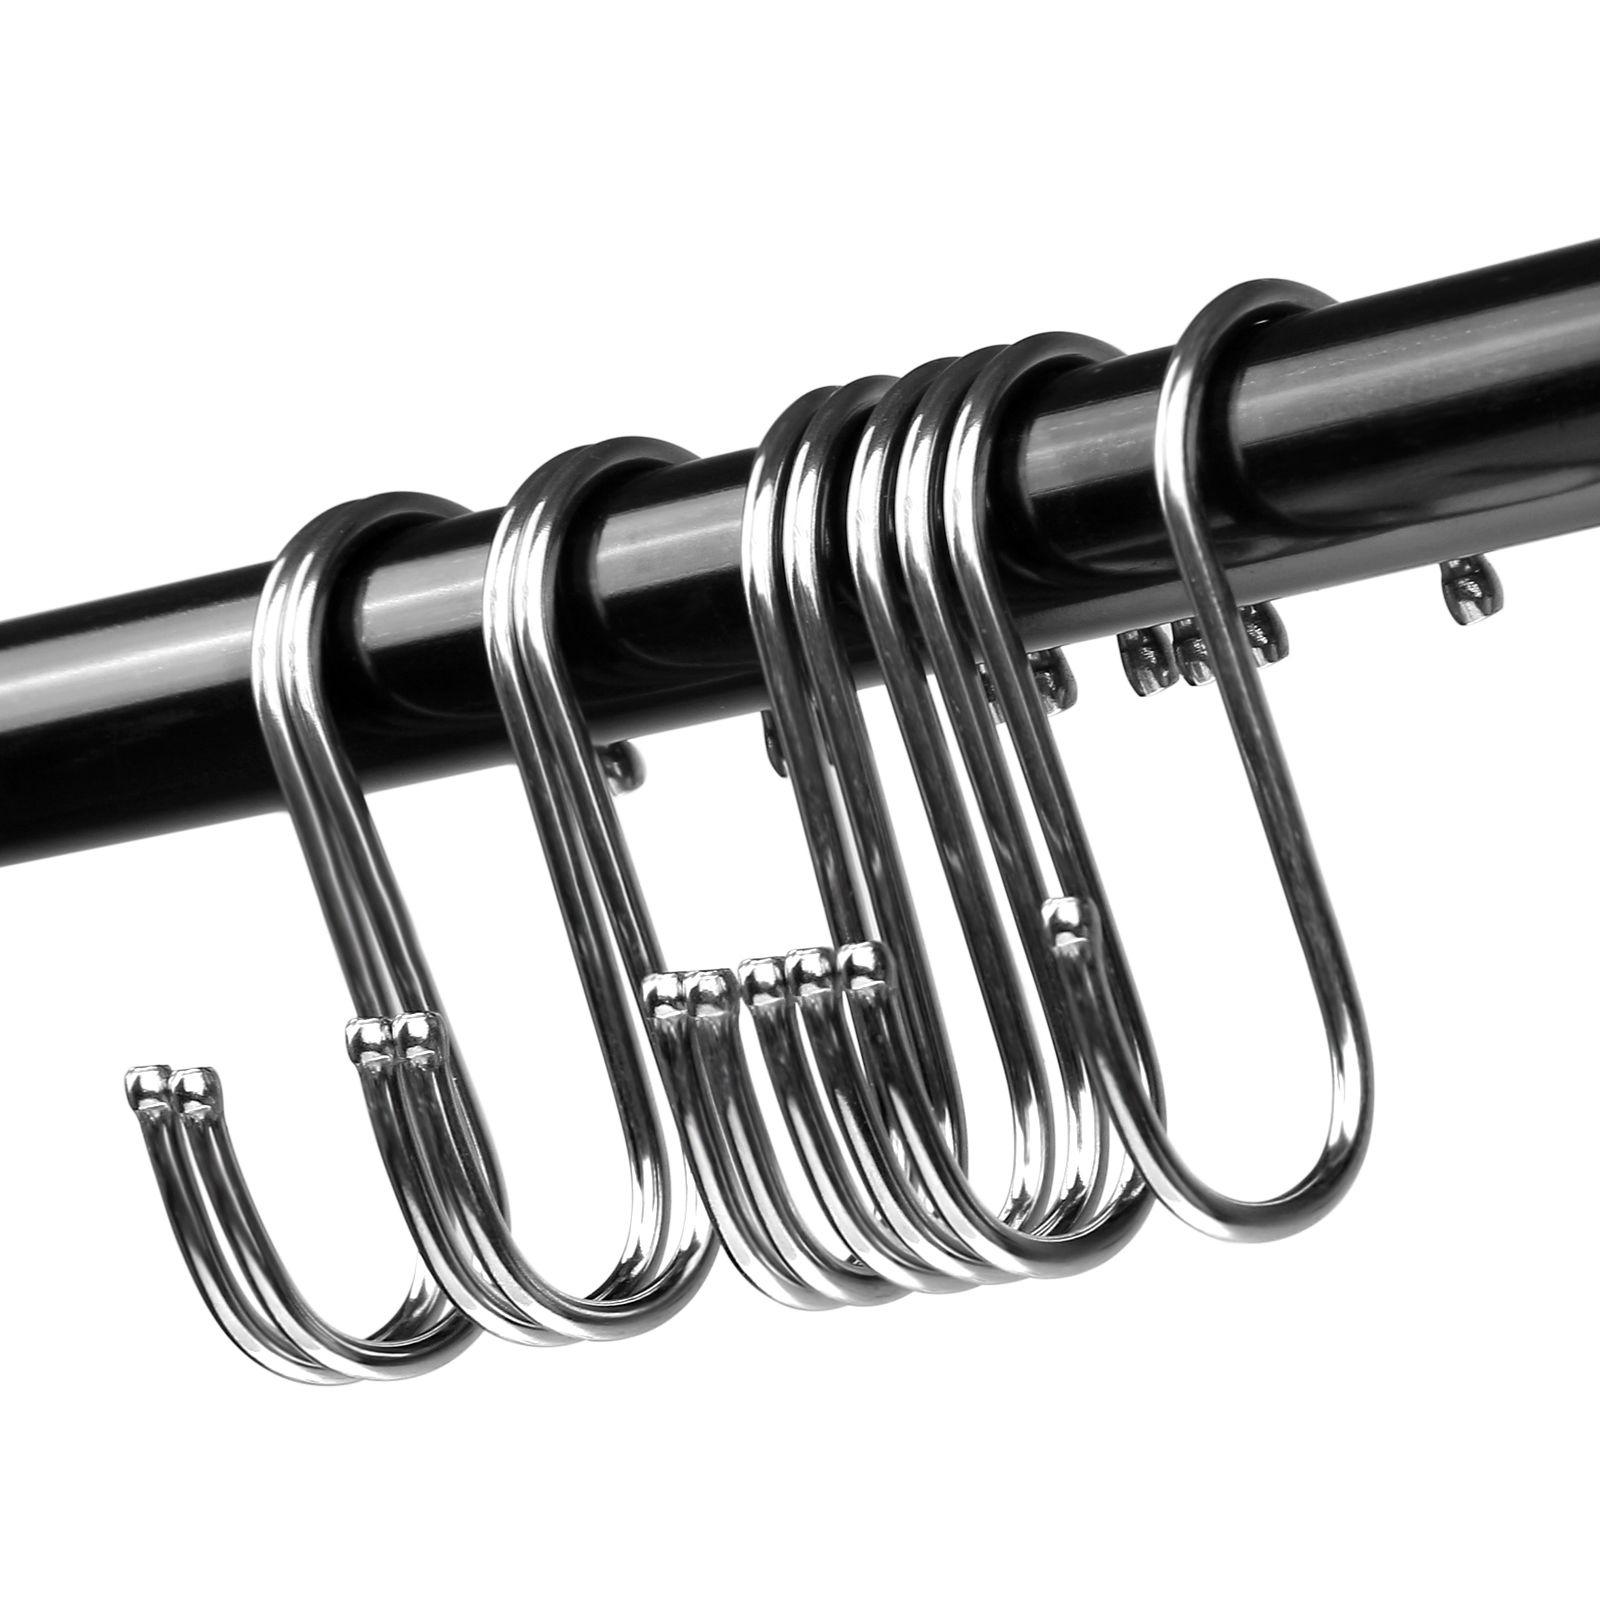 5x stainless s hooks kitchen pot pan hanger clothes storage rack hanging hooks ebay. Black Bedroom Furniture Sets. Home Design Ideas